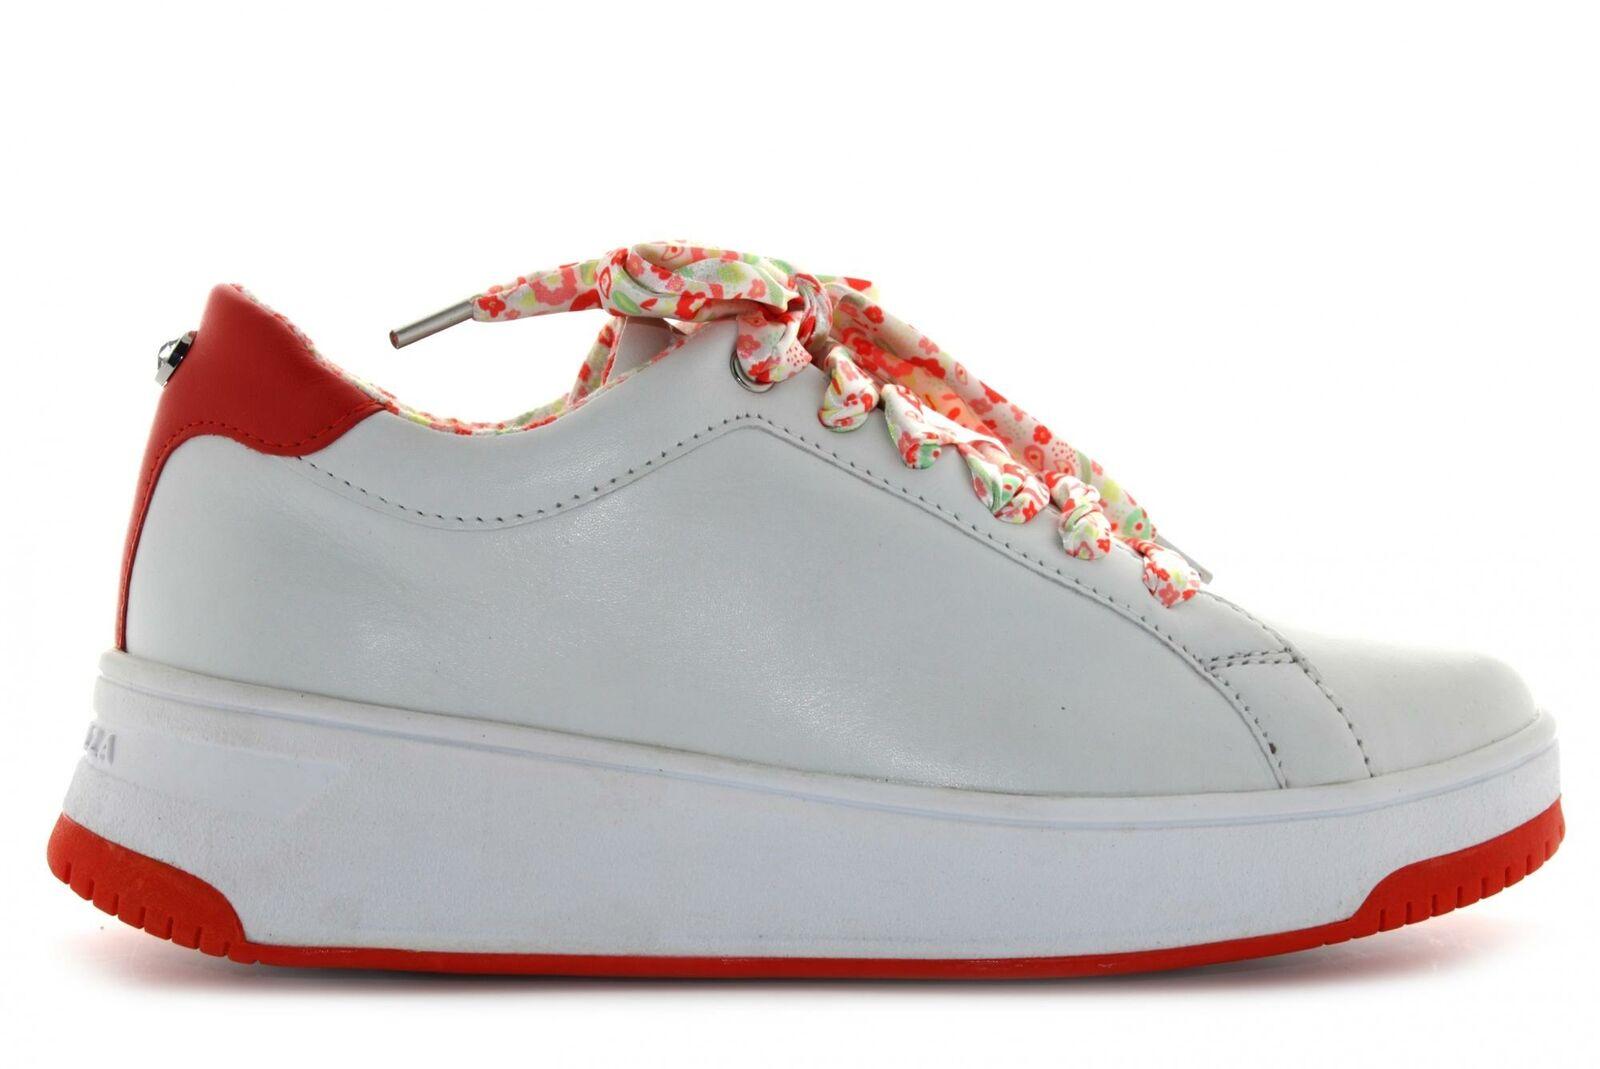 Apepazza P20f chaussures femme baskets basses S0BASKET04 / FLW BIBIANA BIANCO-RO